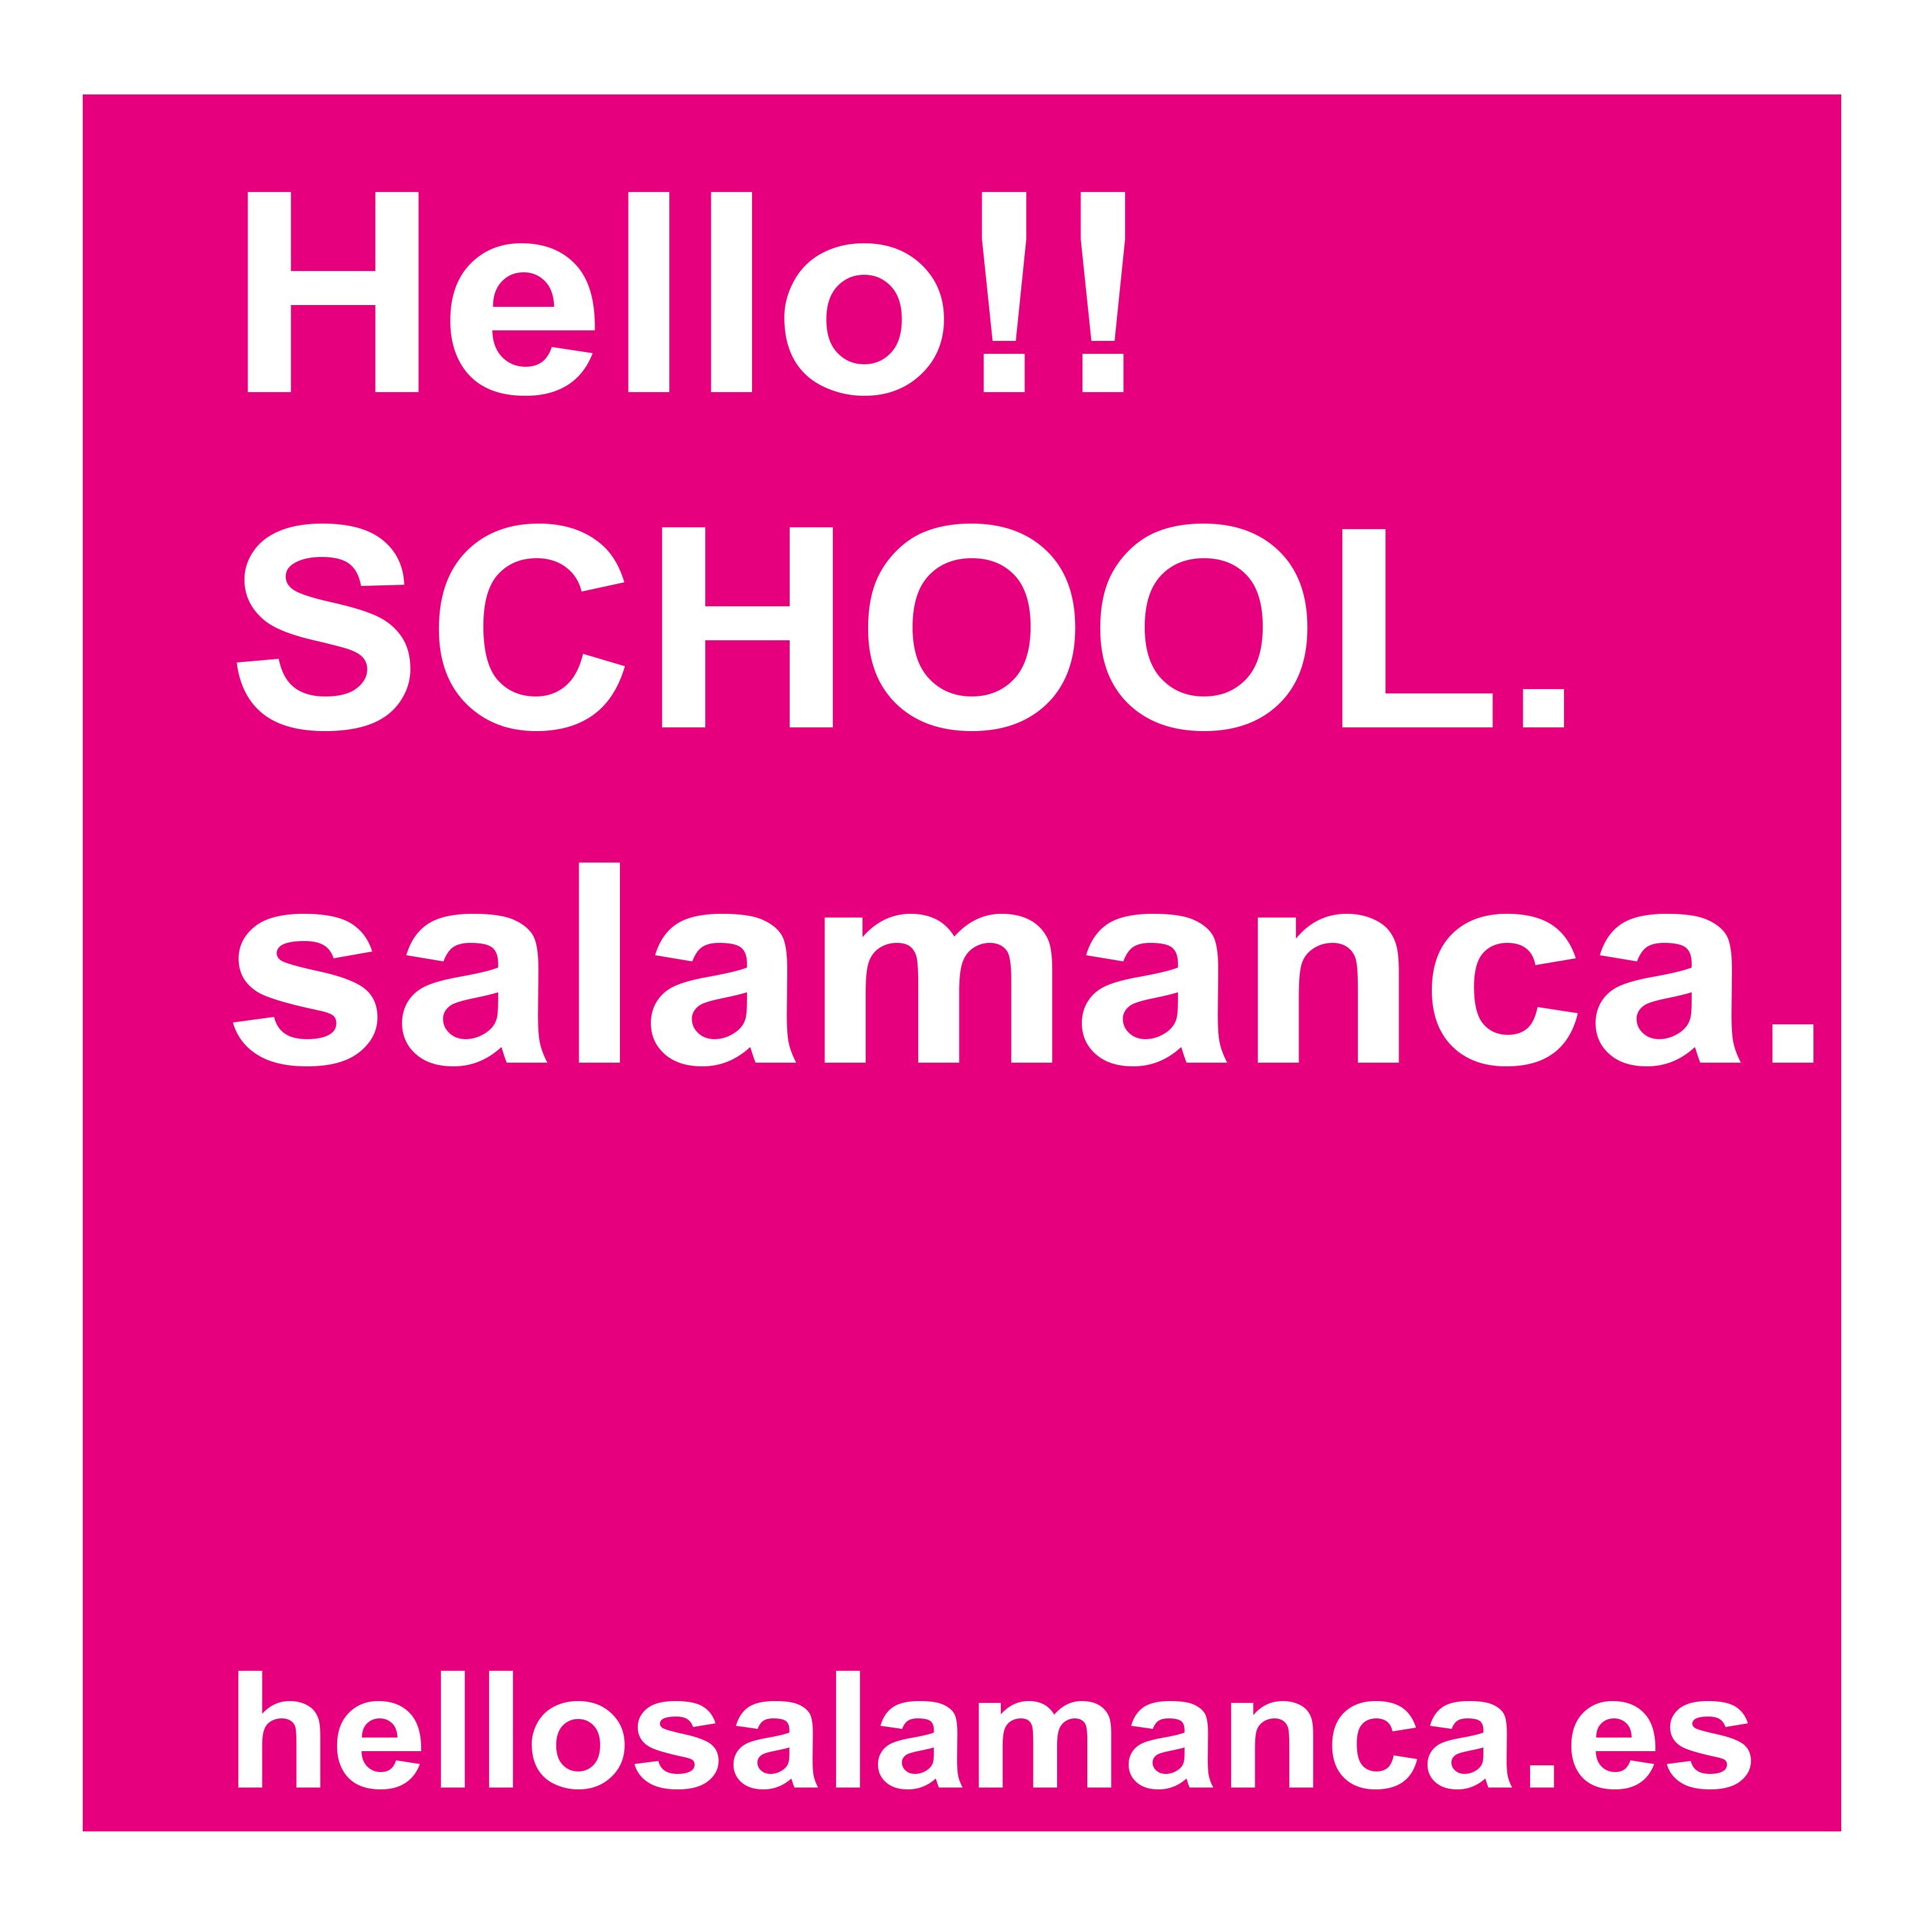 Hello School